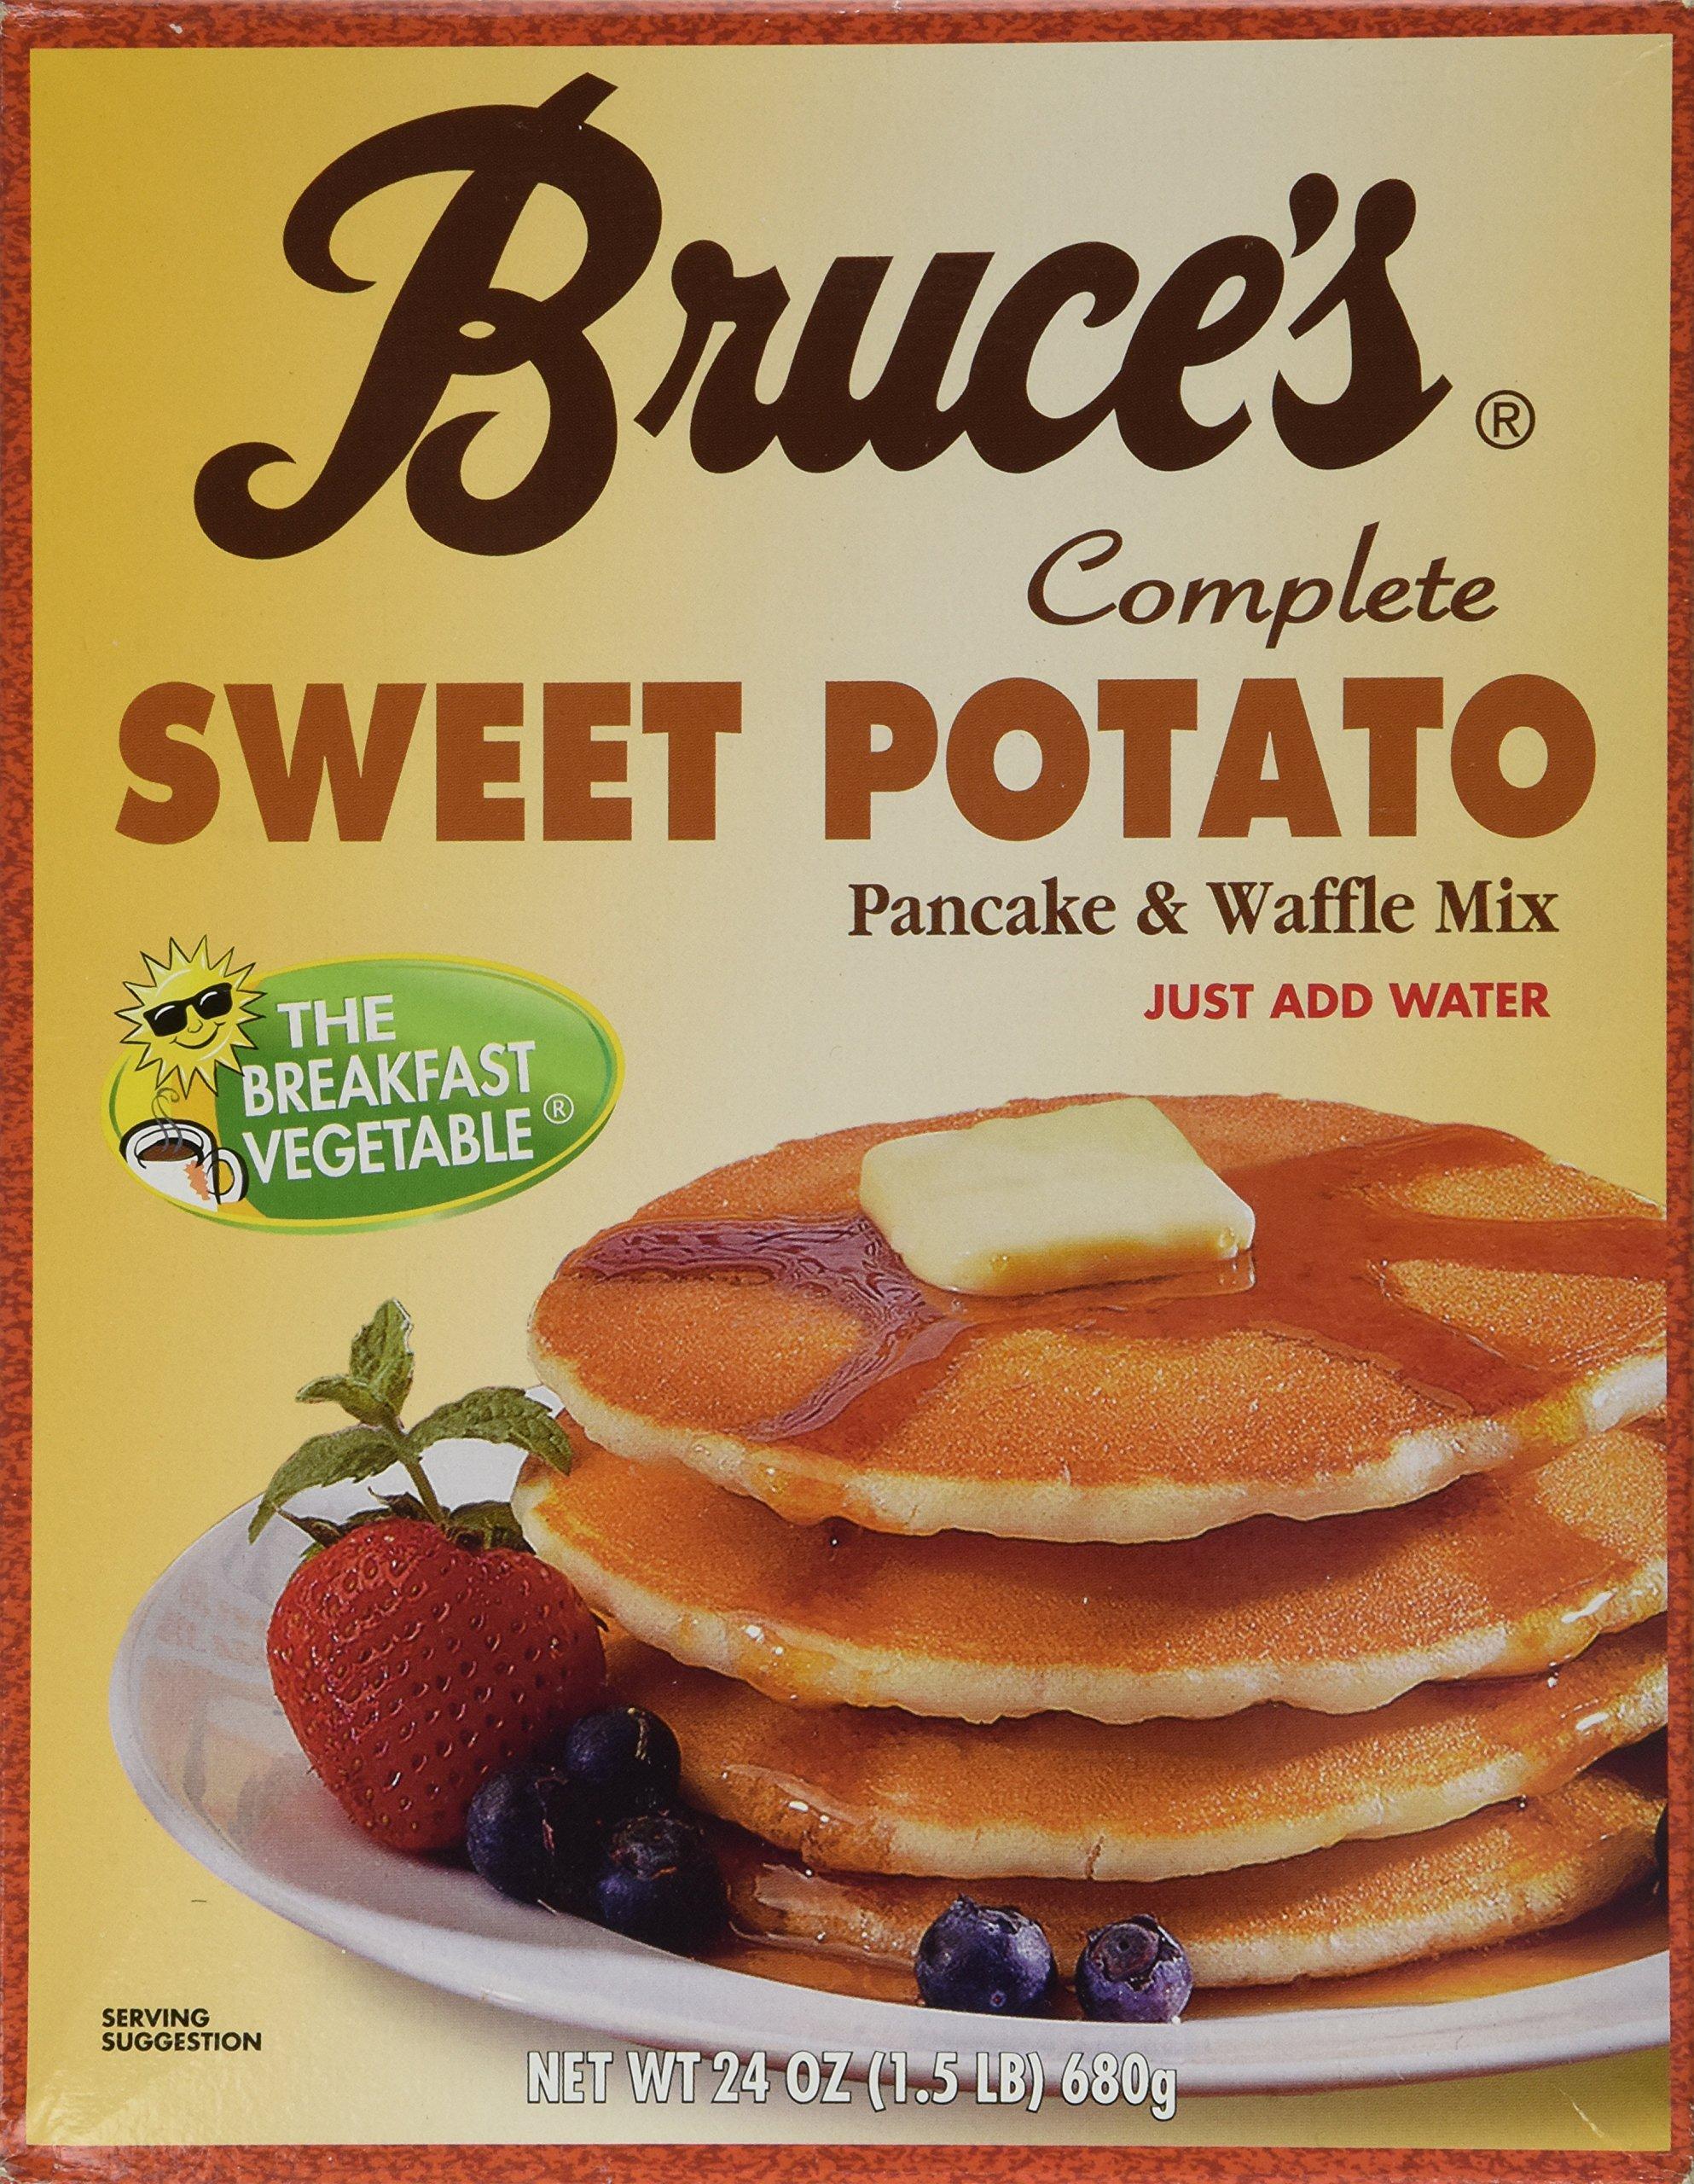 Bruce's Sweet Potato Pancake Mix - 1.5 lb